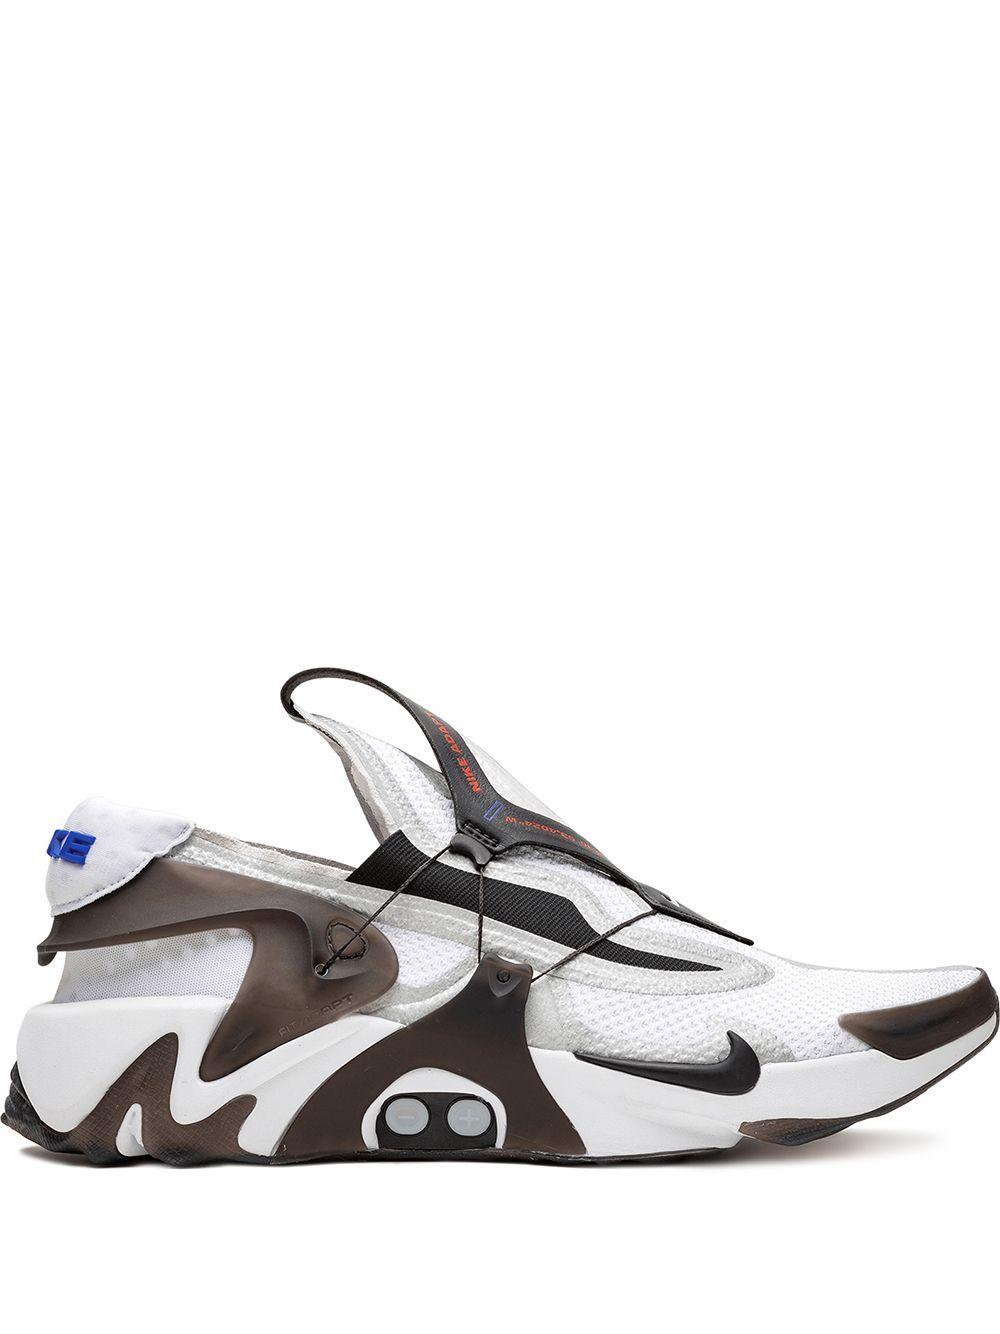 Nike Adapt Huarache Sneakers White Slip On Sneakers